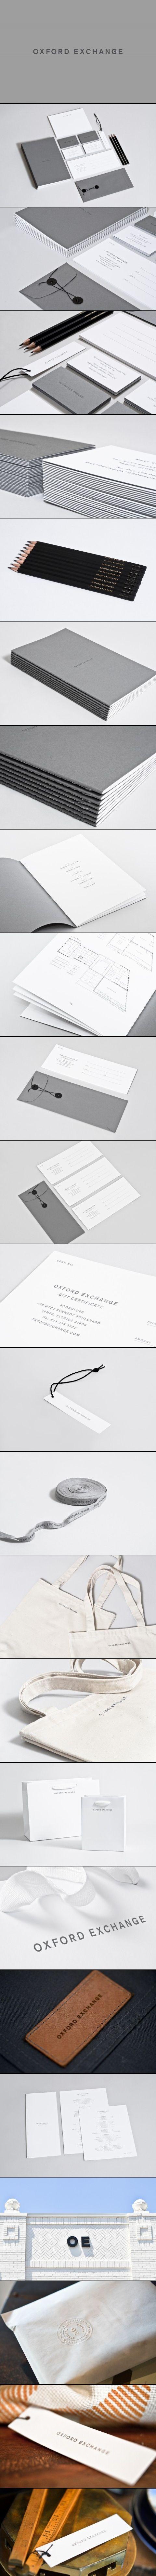 Oxford Exchange | Studio Birdsall #identity #packaging #branding PD